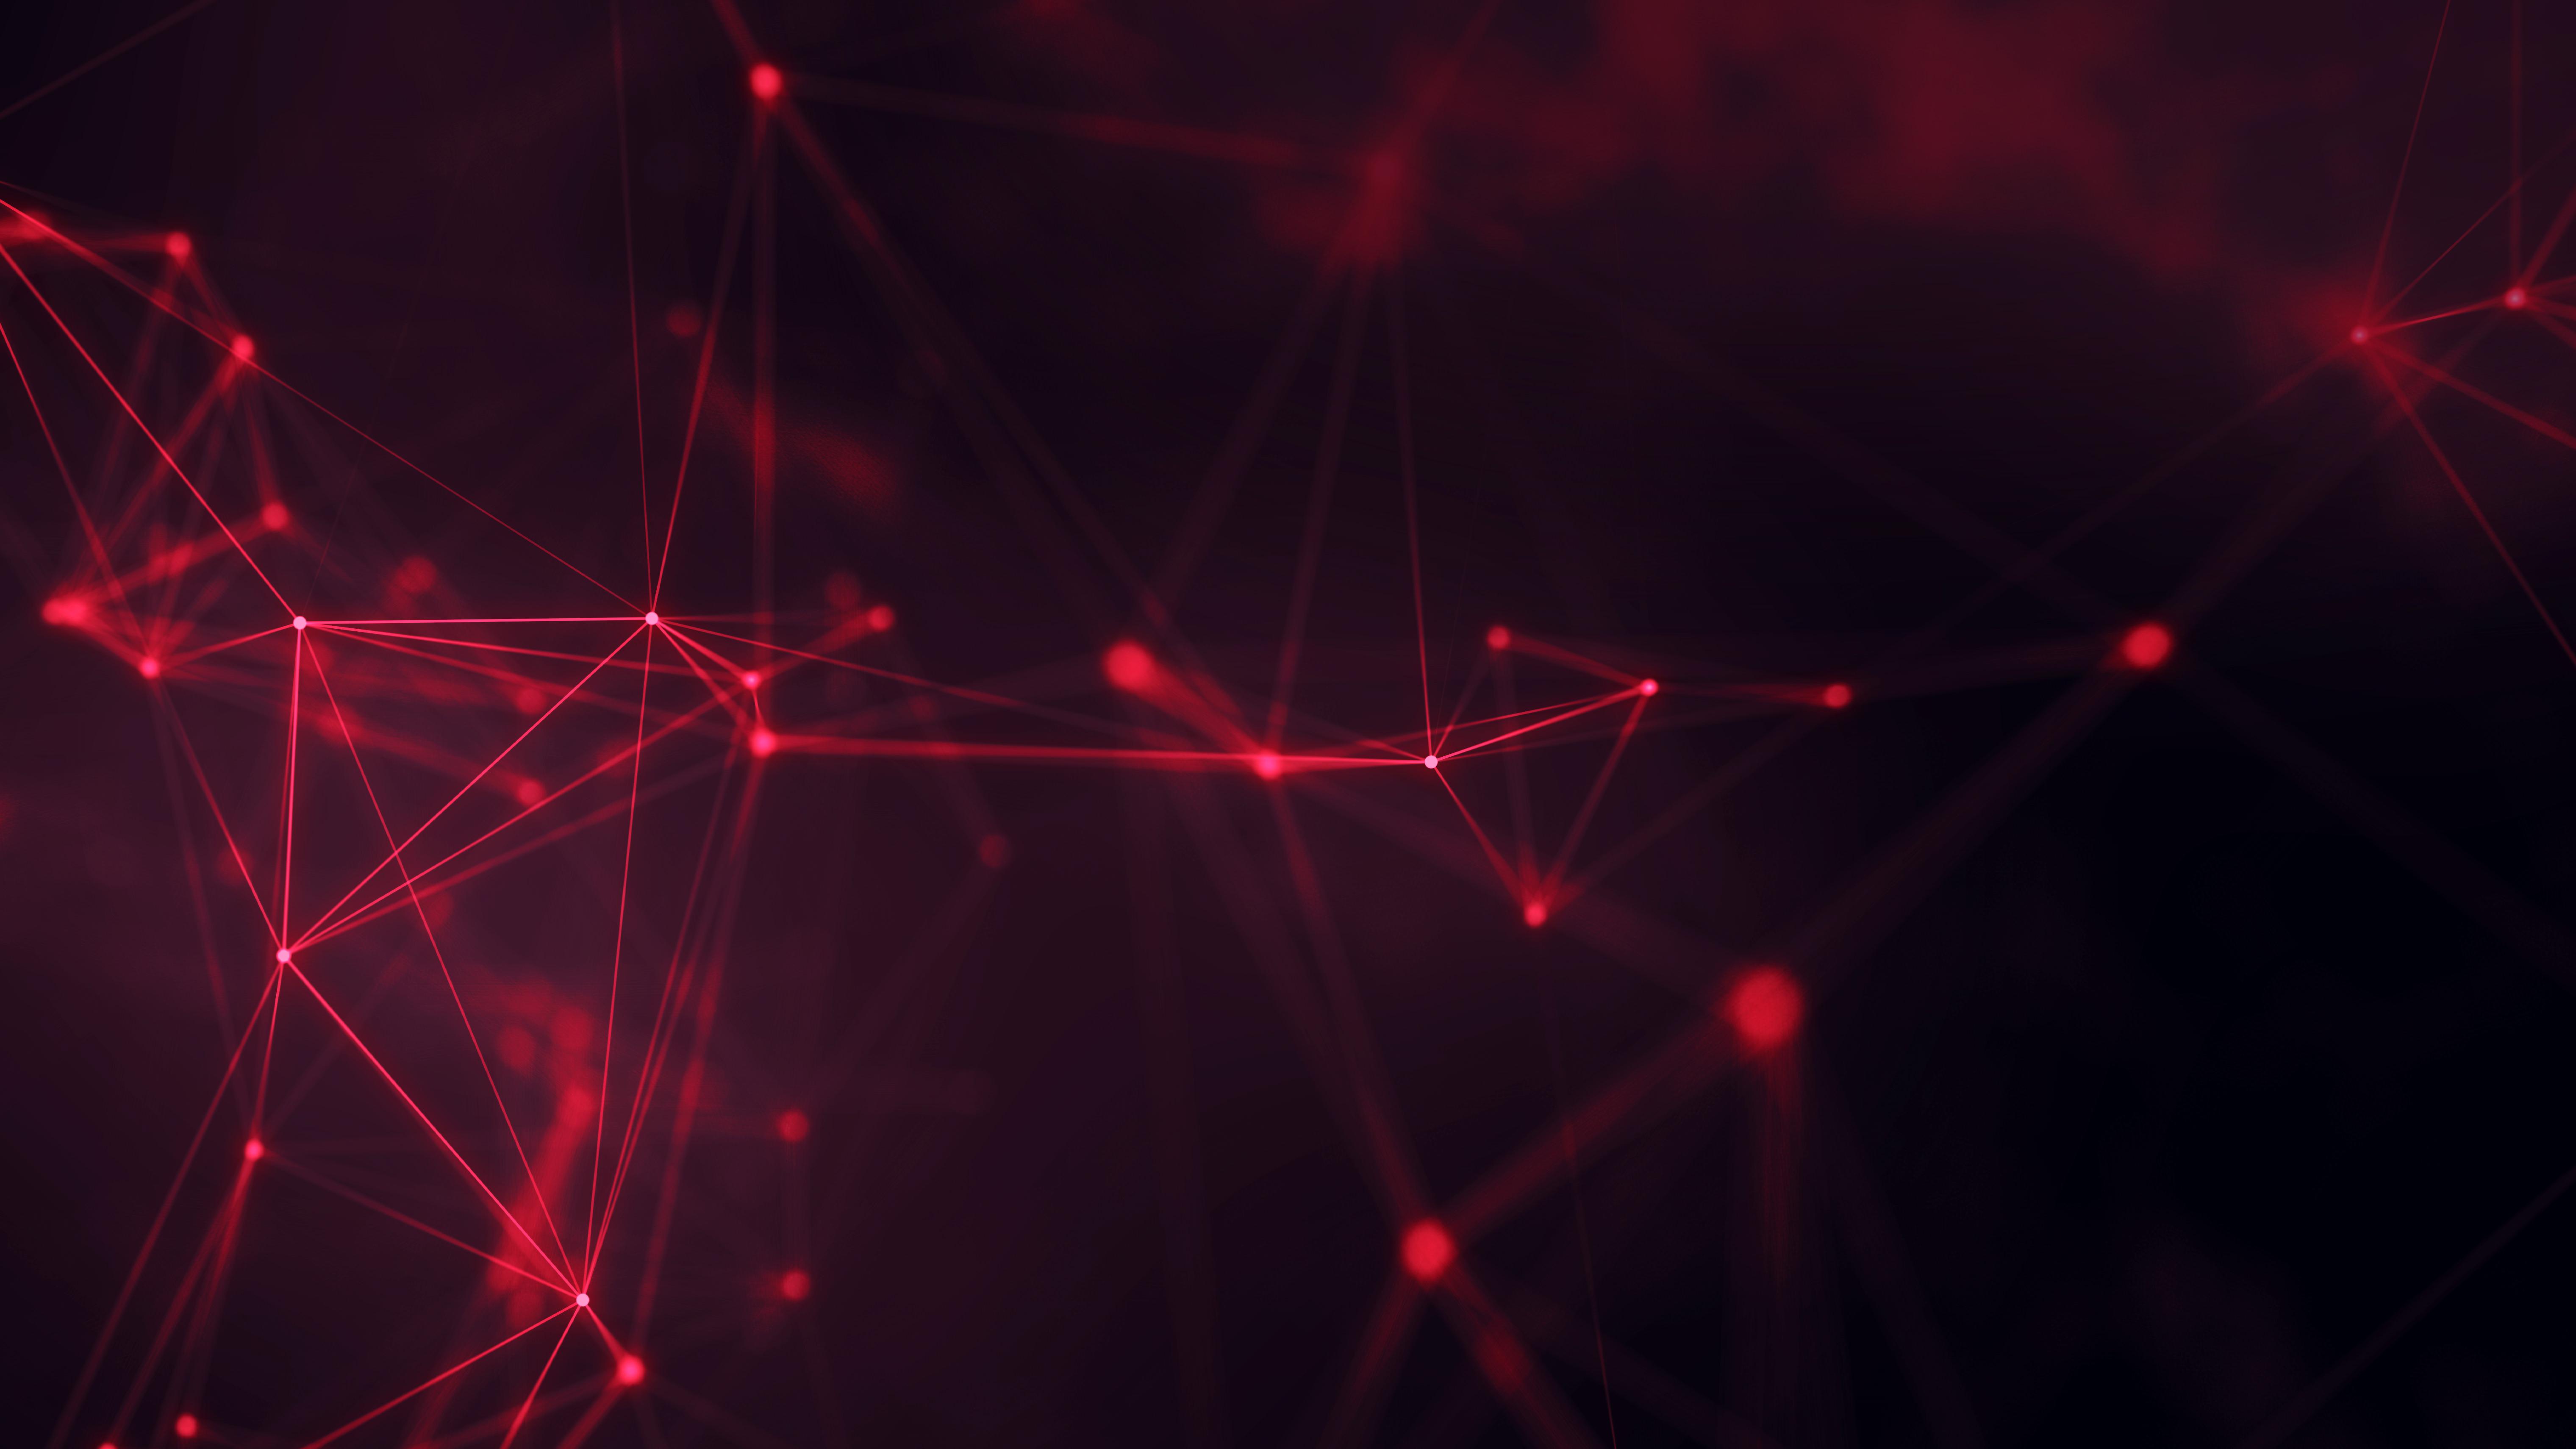 General 6080x3420 geometry cyberspace digital art red lines abstract